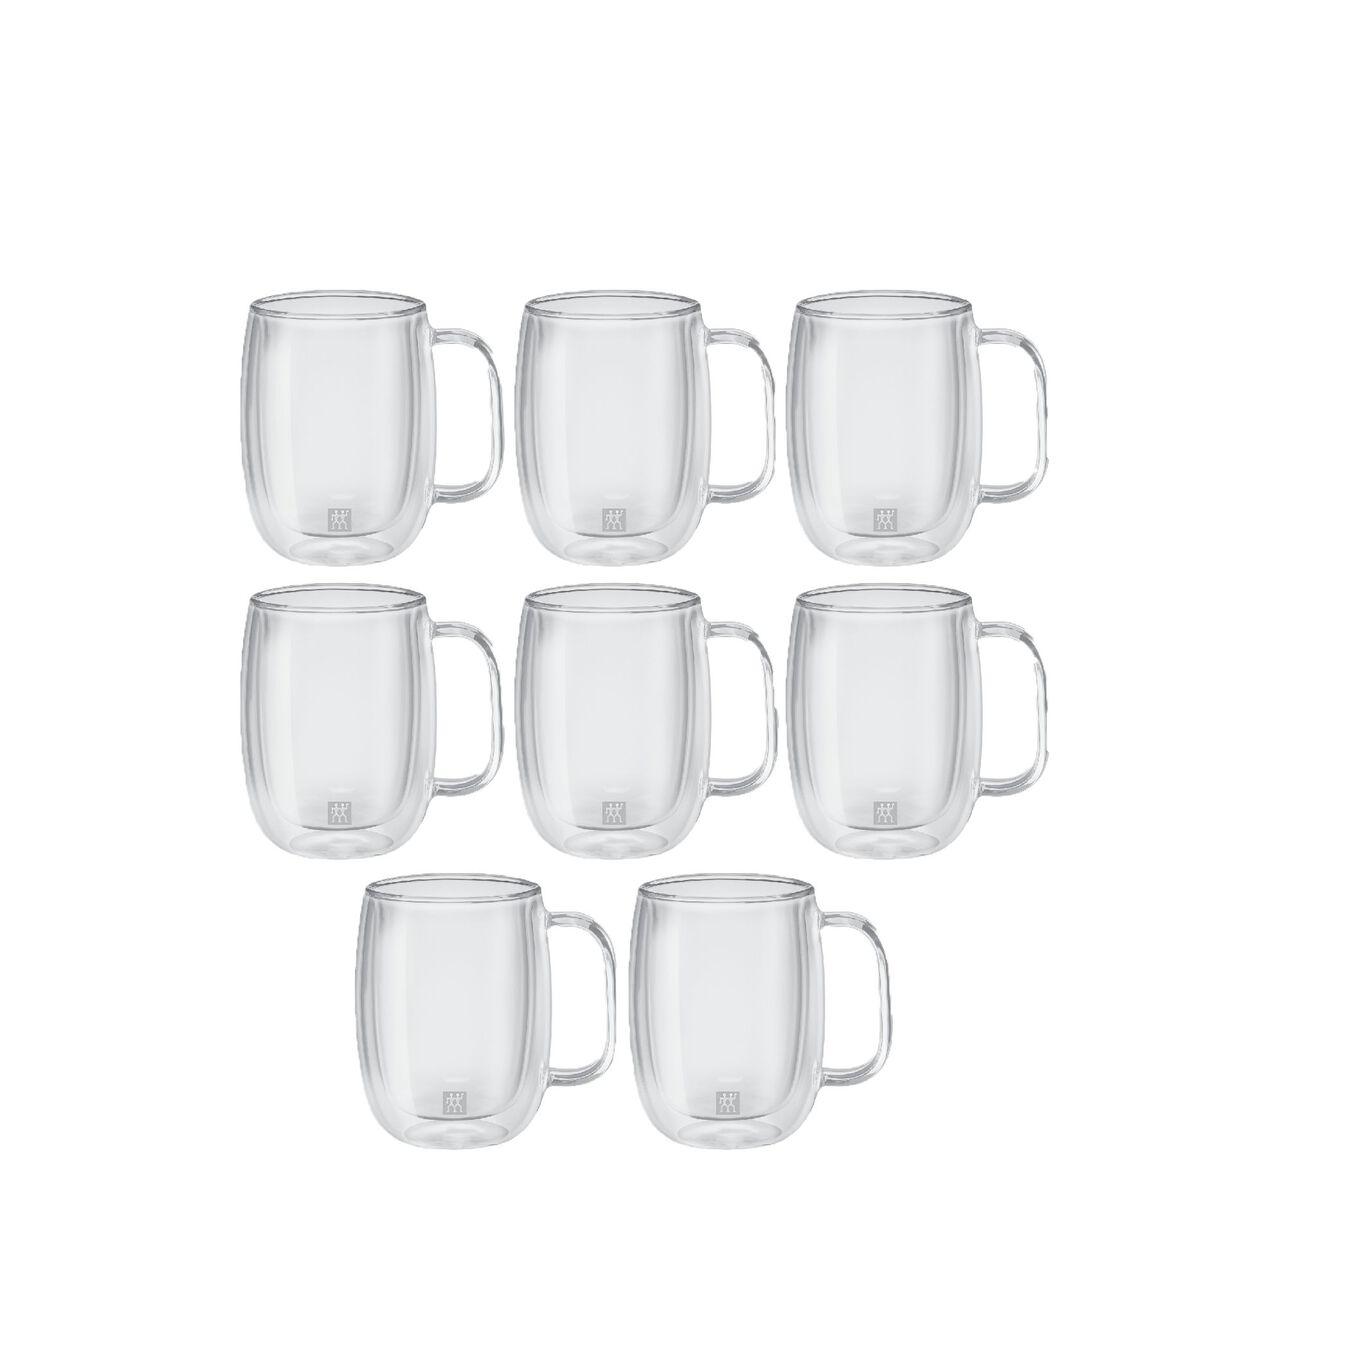 8 Piece Coffee Mug Set - Value Pack,,large 2